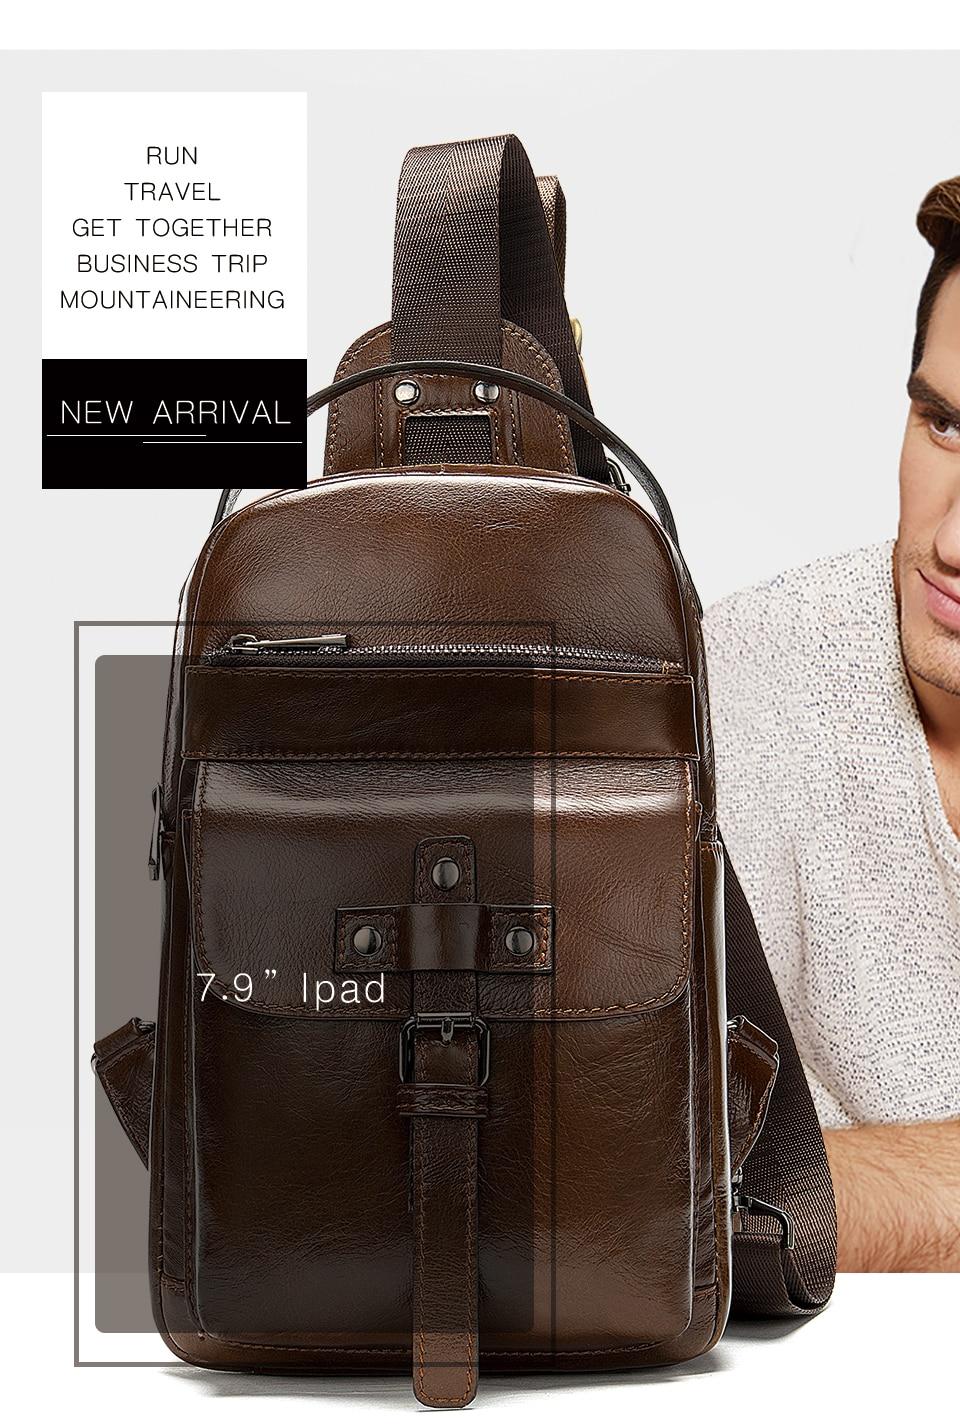 3 Men's Bag Leather Sling Bag Caual Men's Shoulder Bag Vintage Crossbody Bags for Men with Headphone Hole Travel Chest Pack